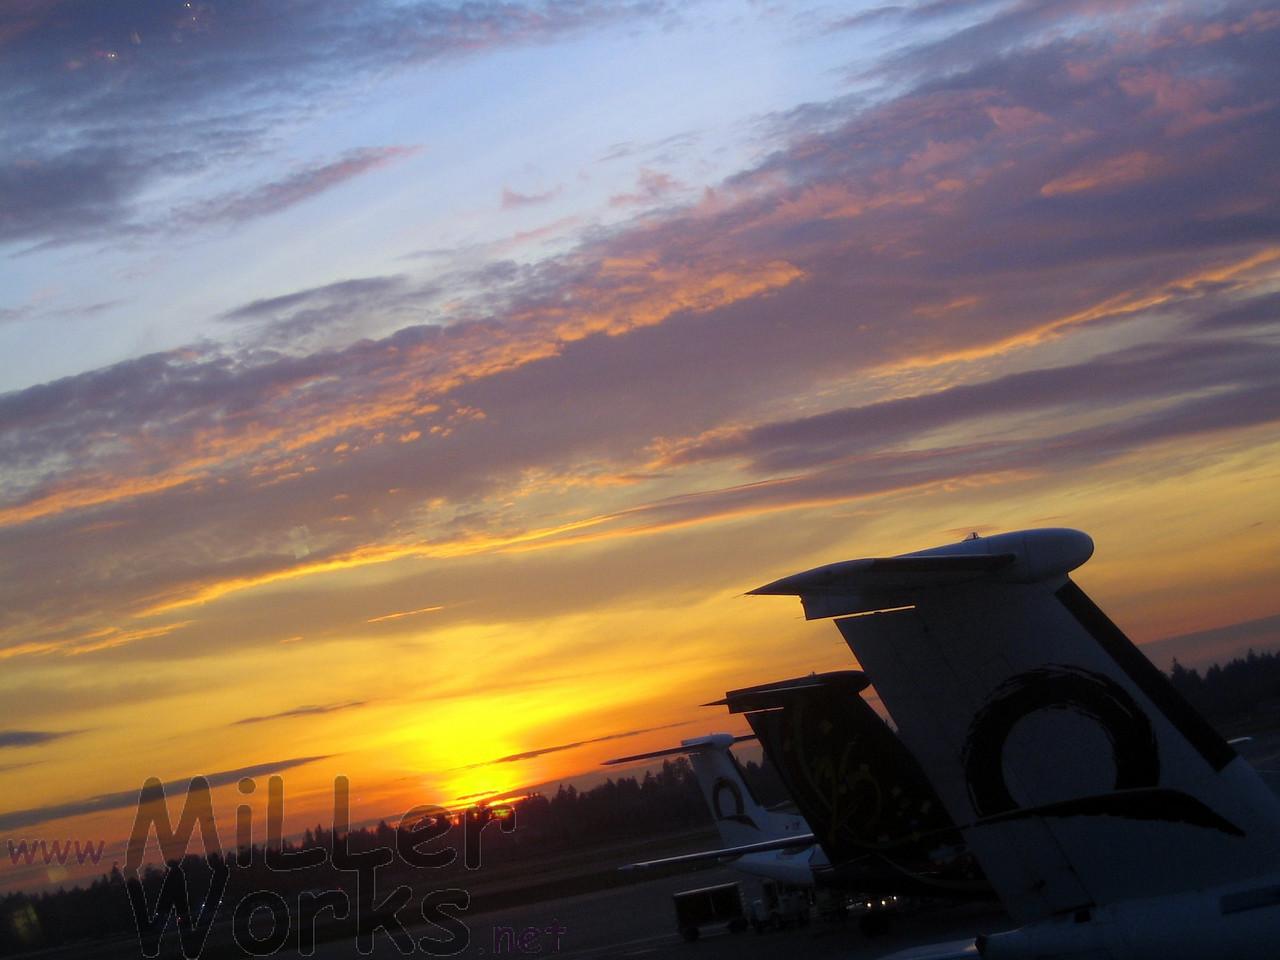 Sunset at Sea-Tac